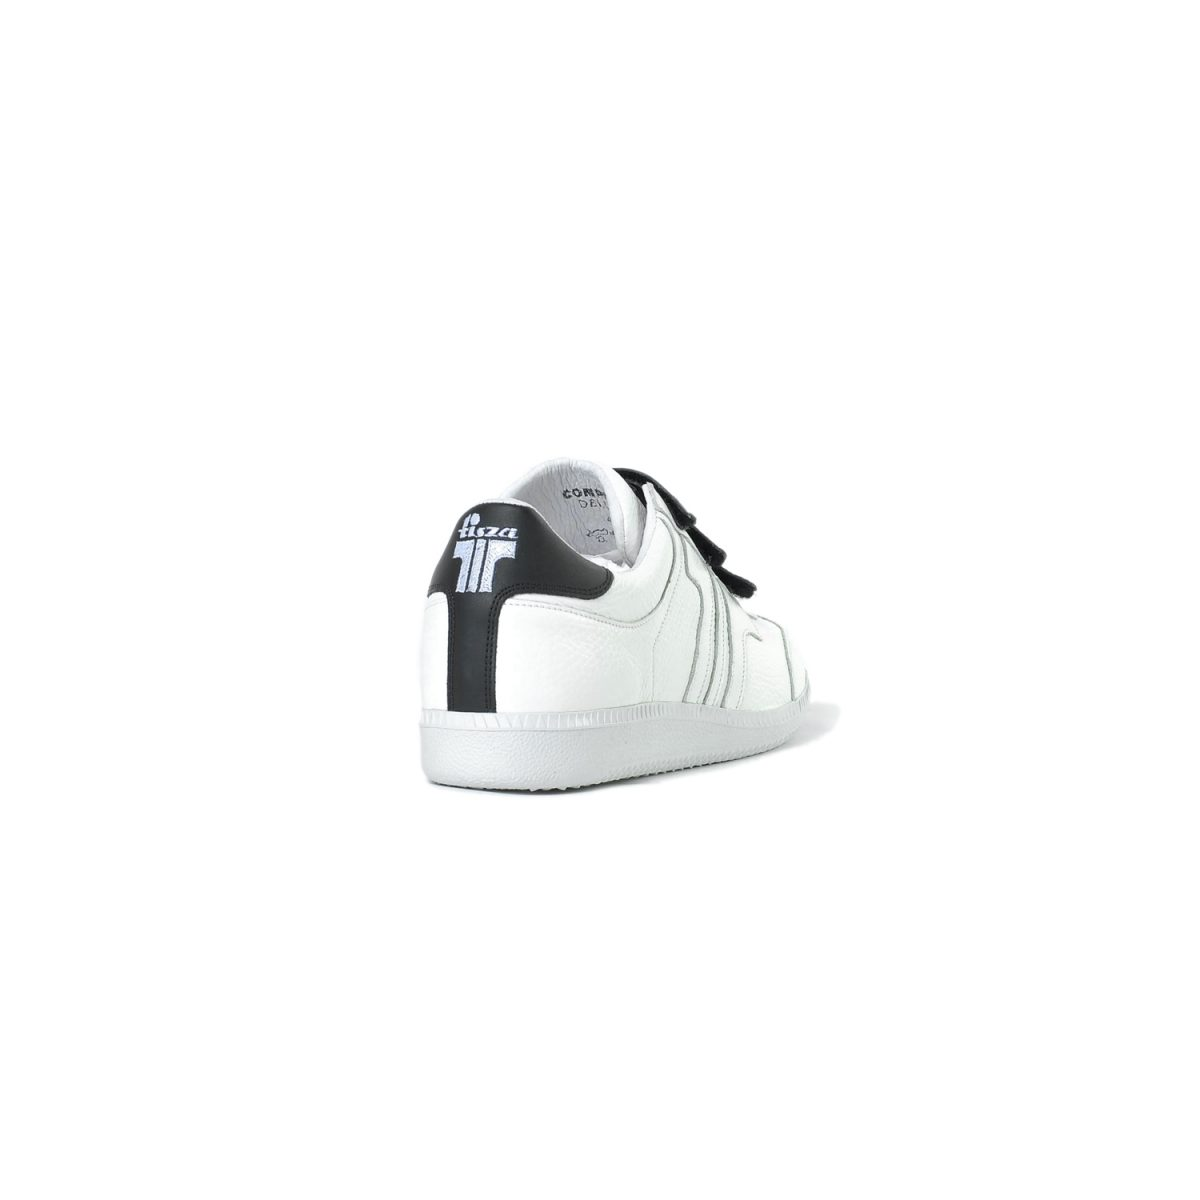 Tisza shoes - Compakt delux - White-black